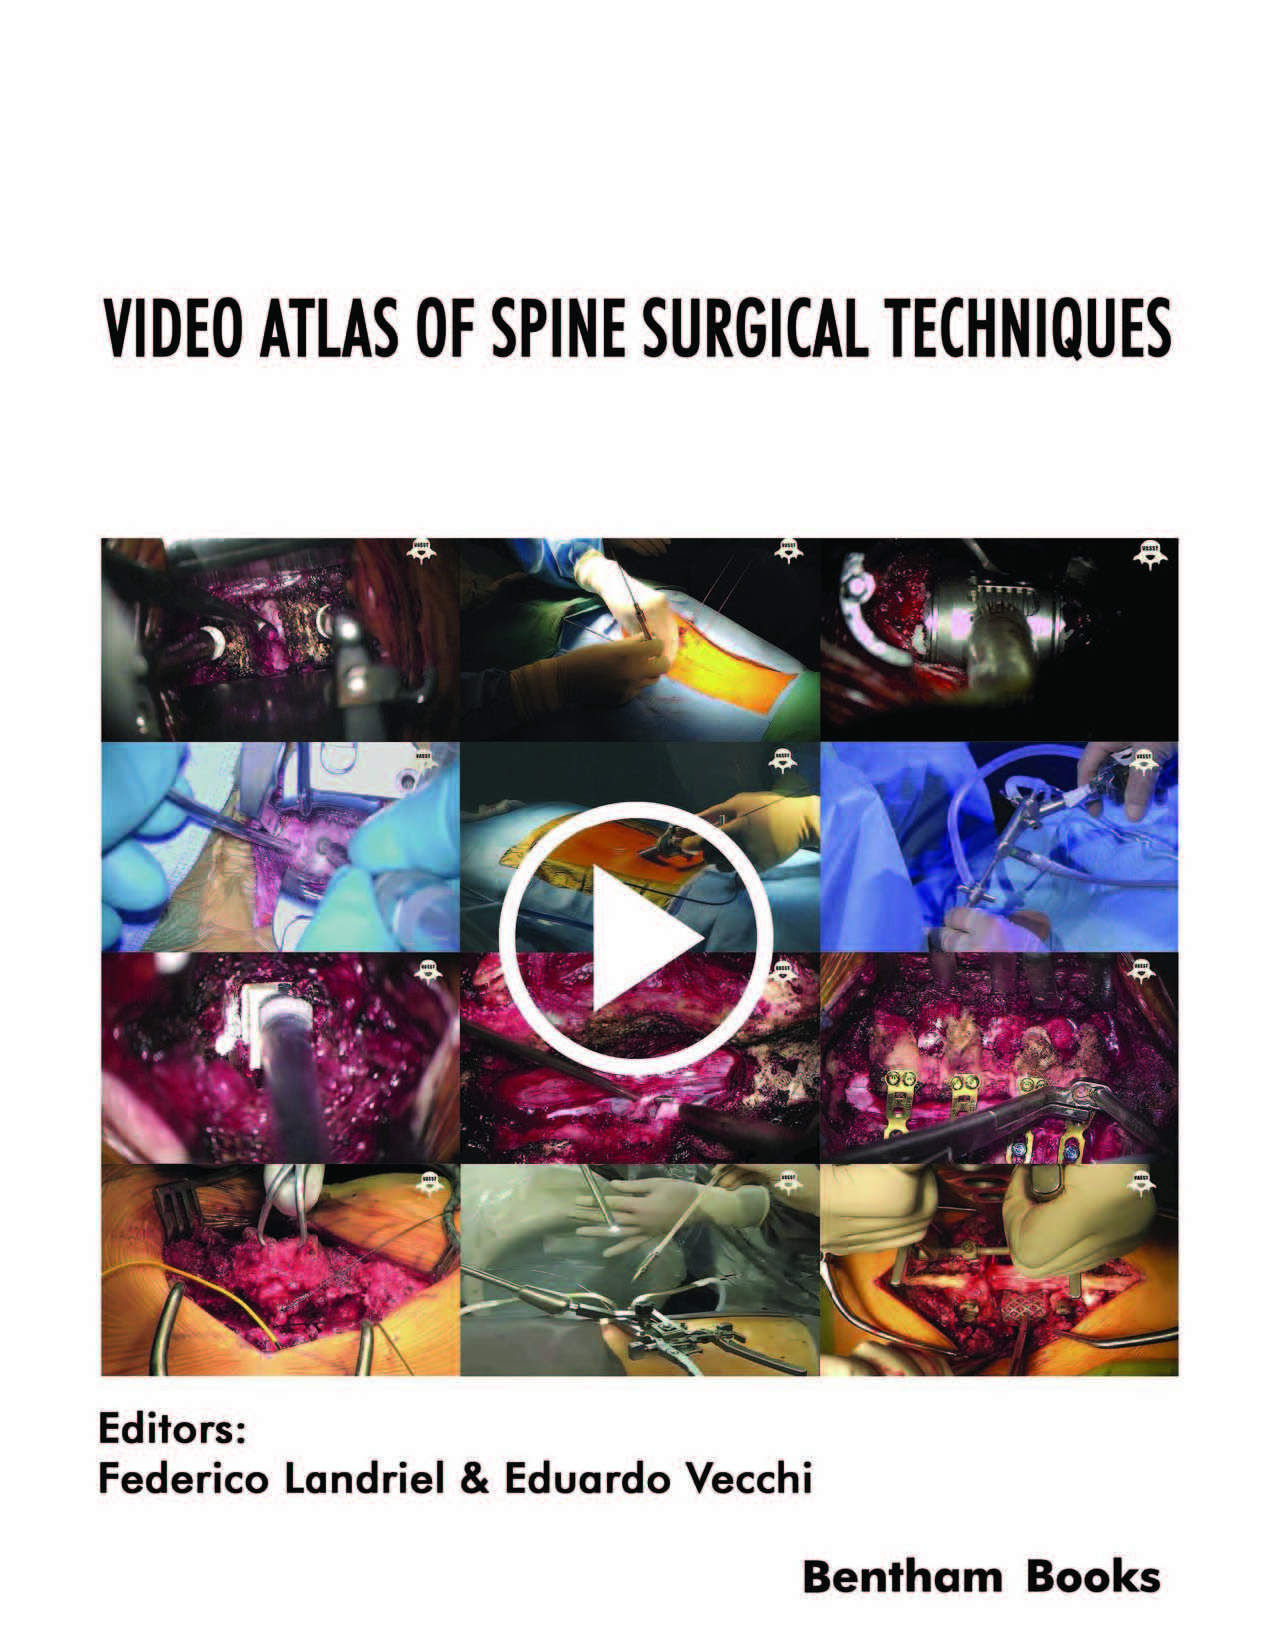 A video atlas of neuromuscular disorders array ebooks by subject bentham ebooks rh ebooks benthamscience com fandeluxe Images